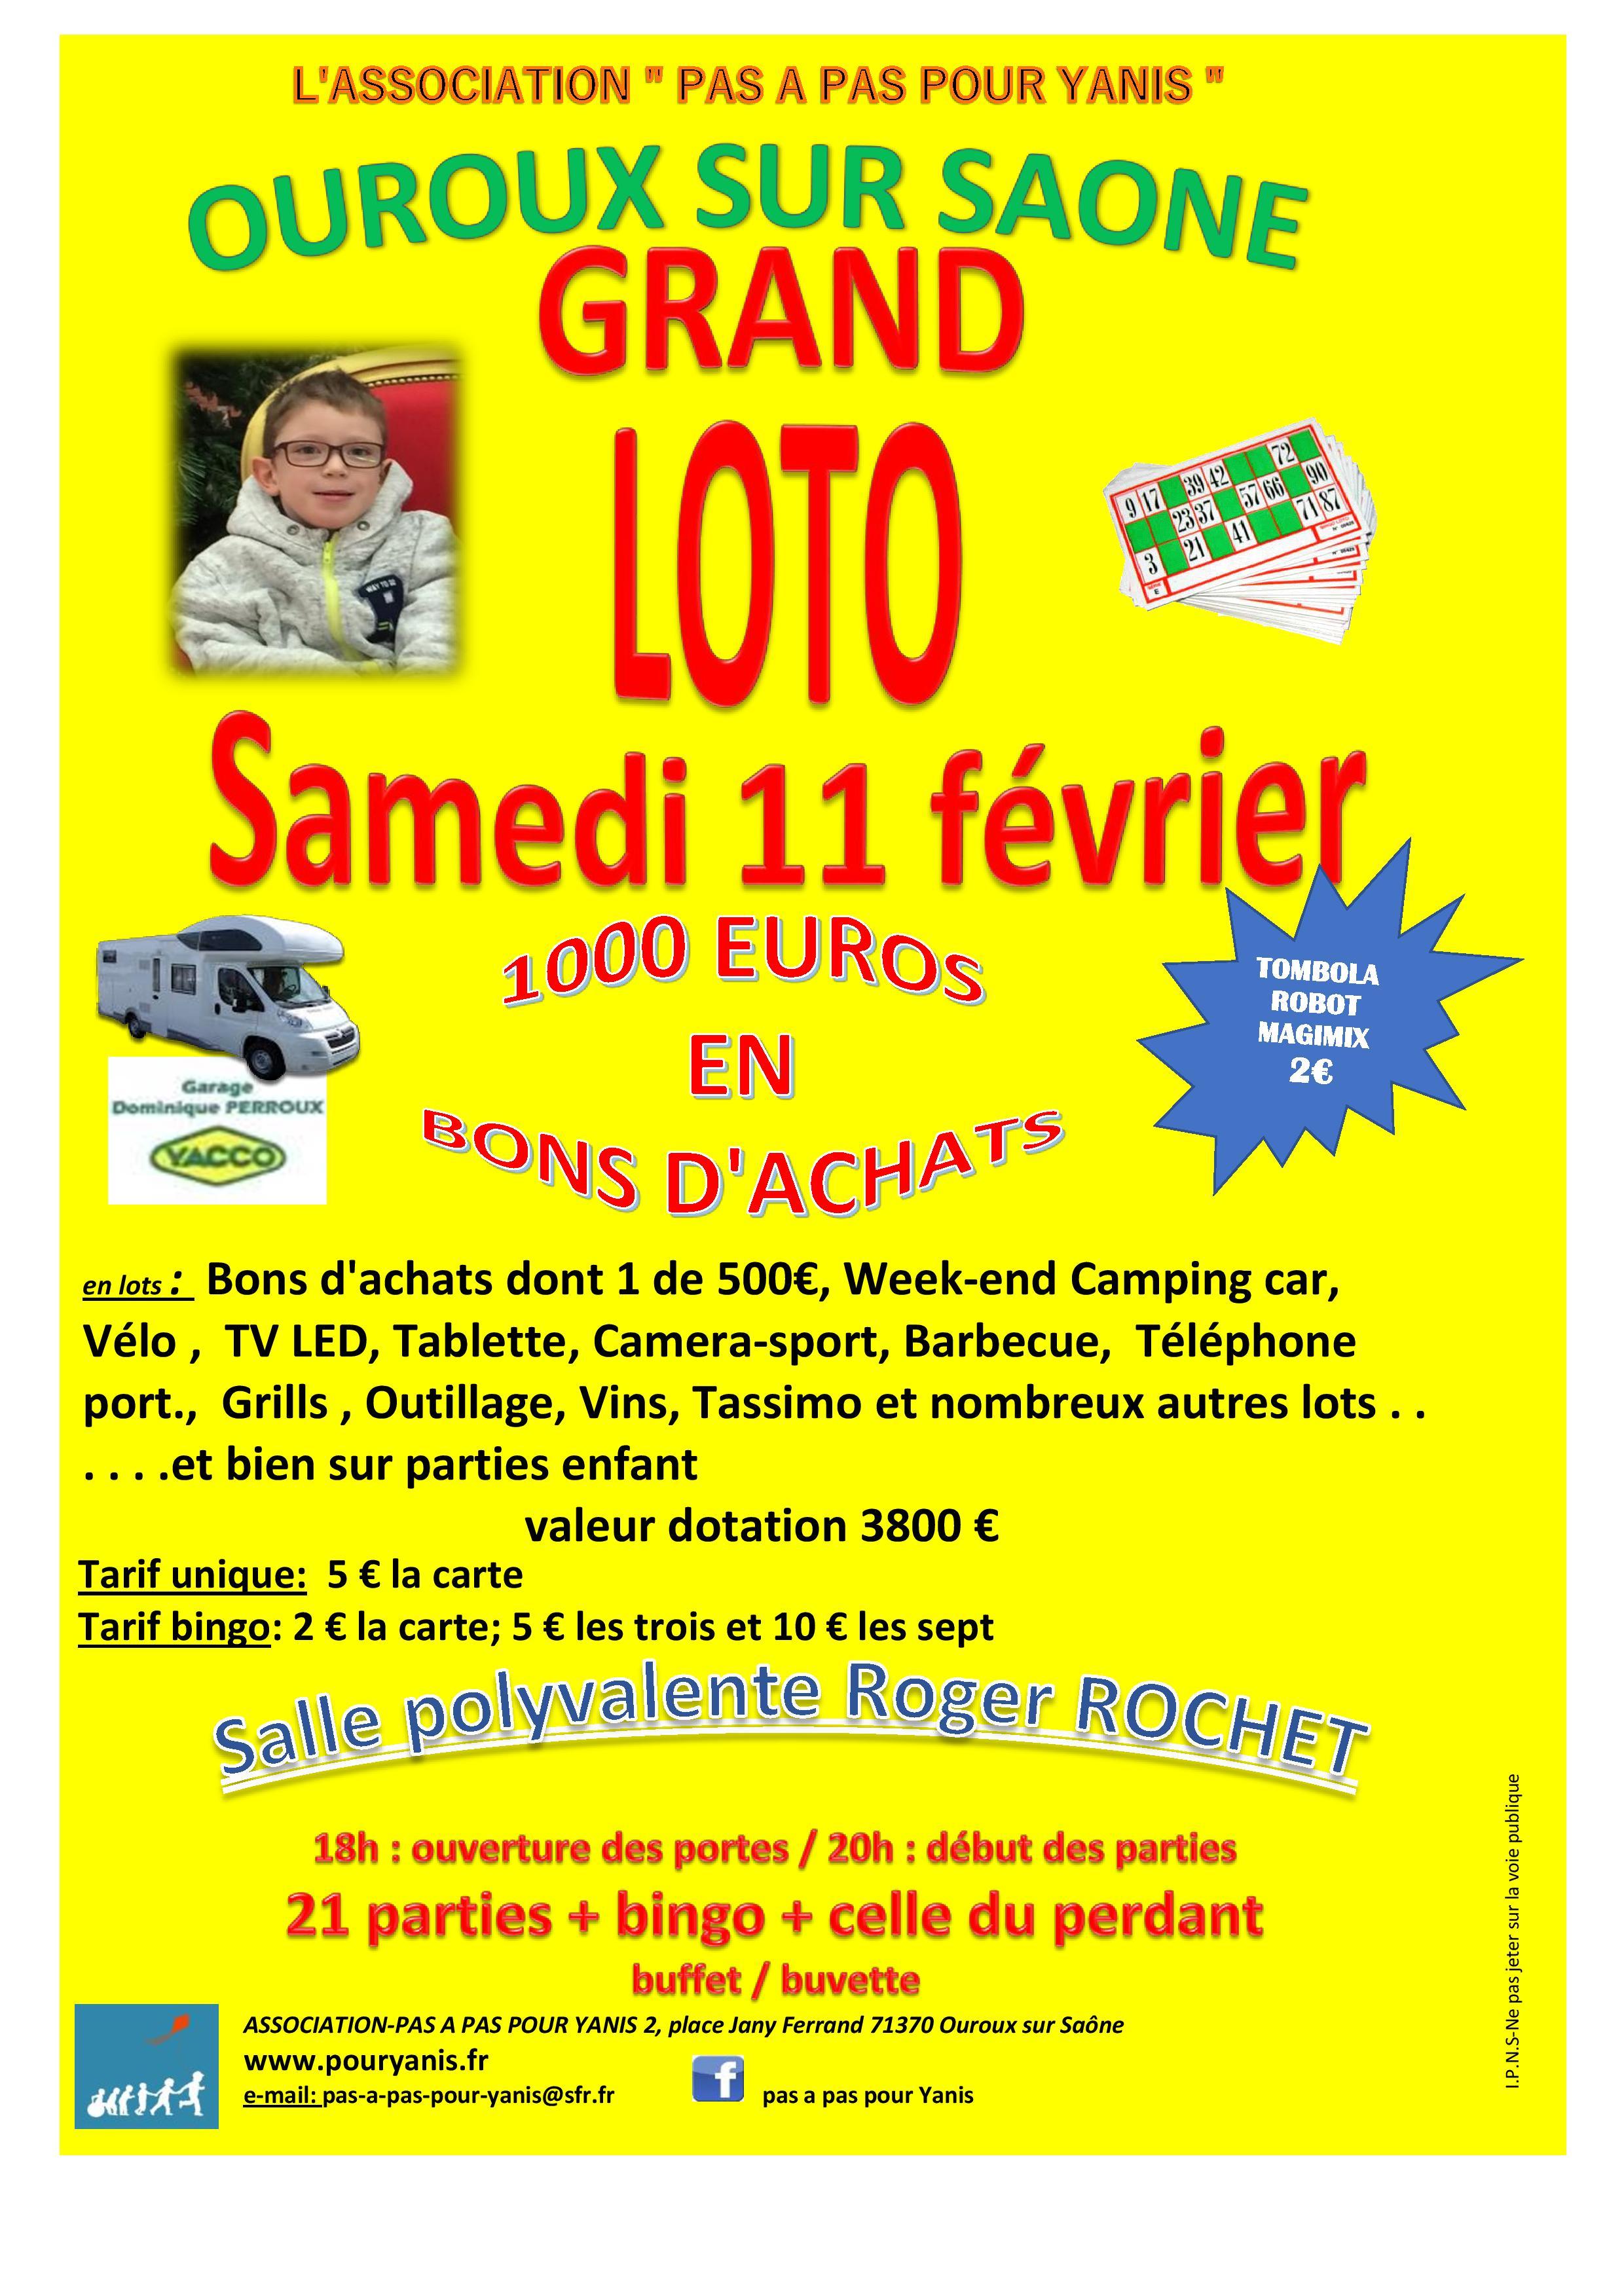 loto 11 fev. 2017 fond jaune-page-001